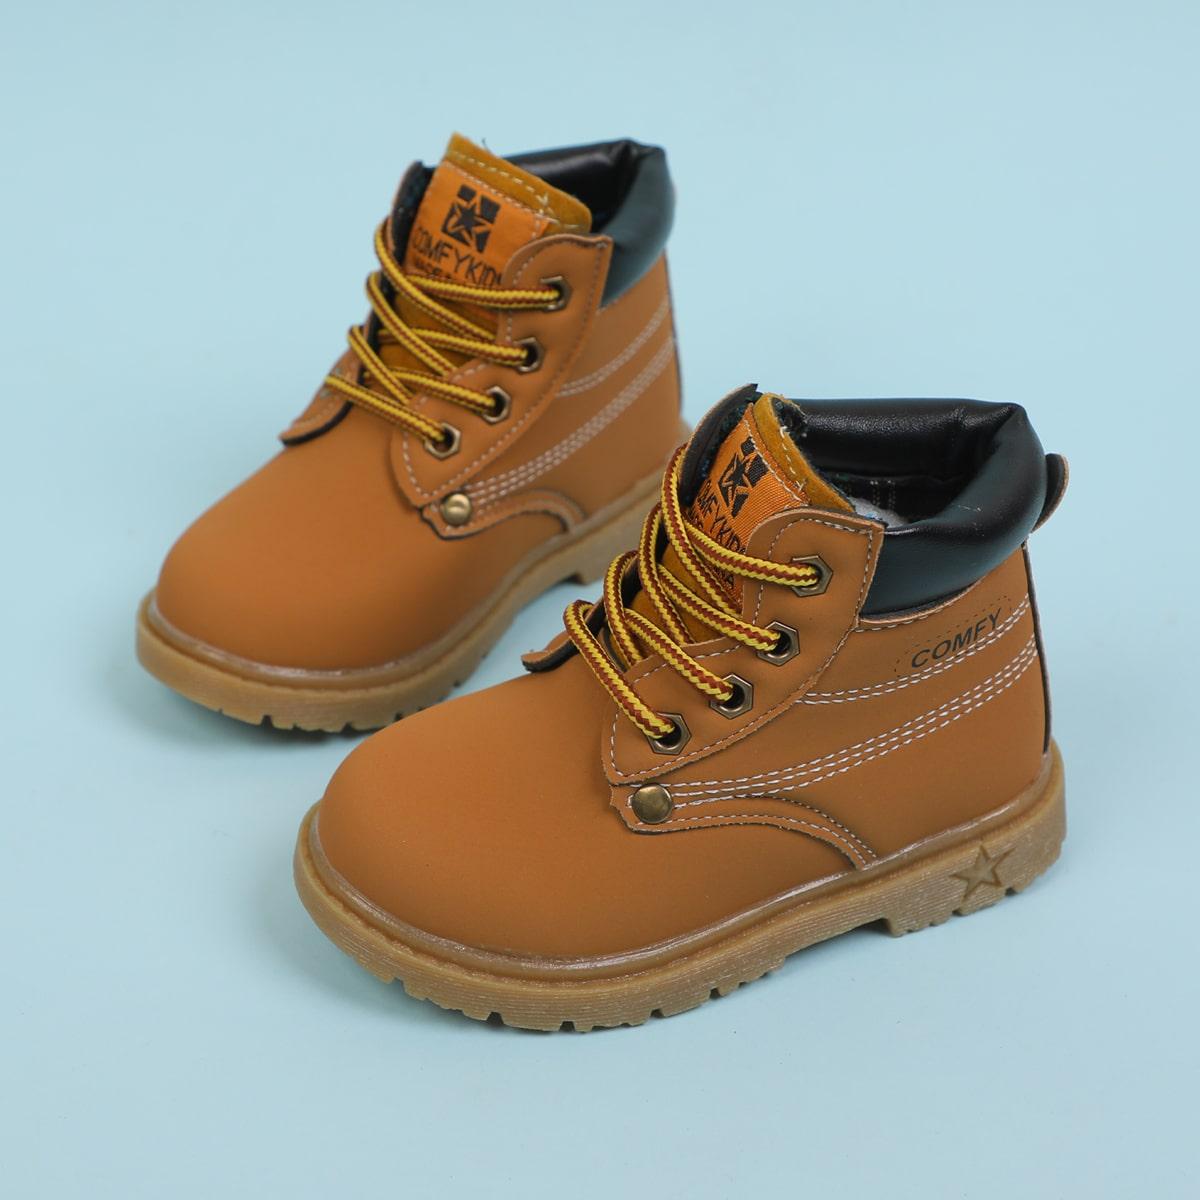 Ботинки со шнурком для девочек SheIn sk2107051175667662